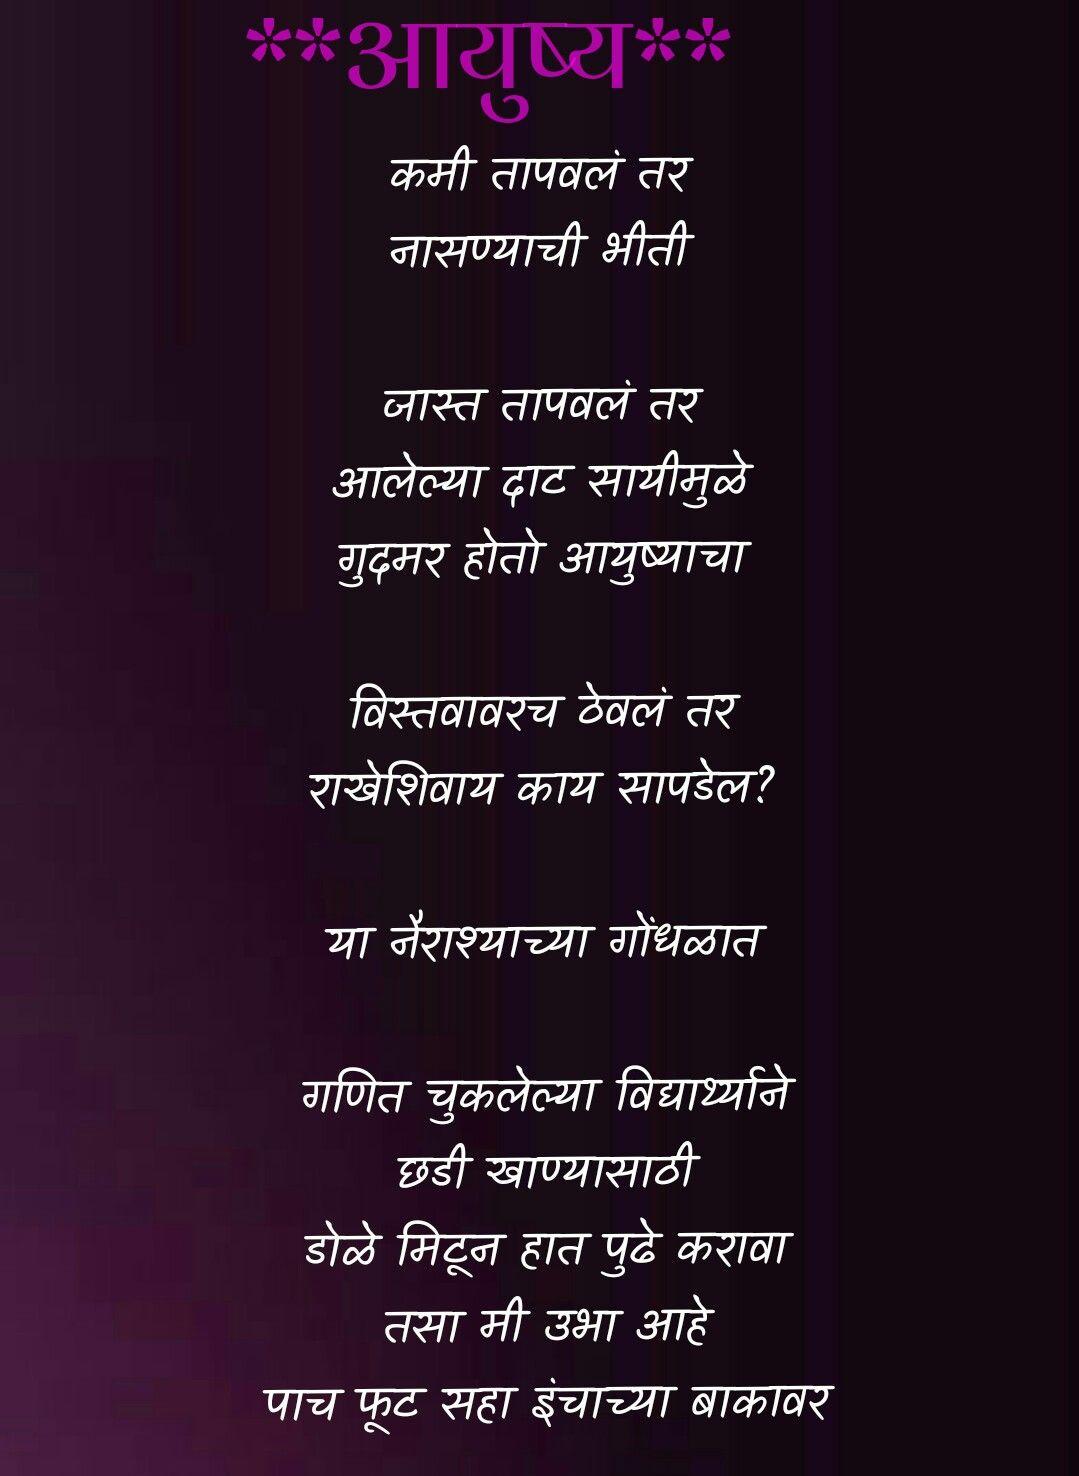 नैराश्याच्या गोंधळात Marathi poems, Marathi quotes, Poems